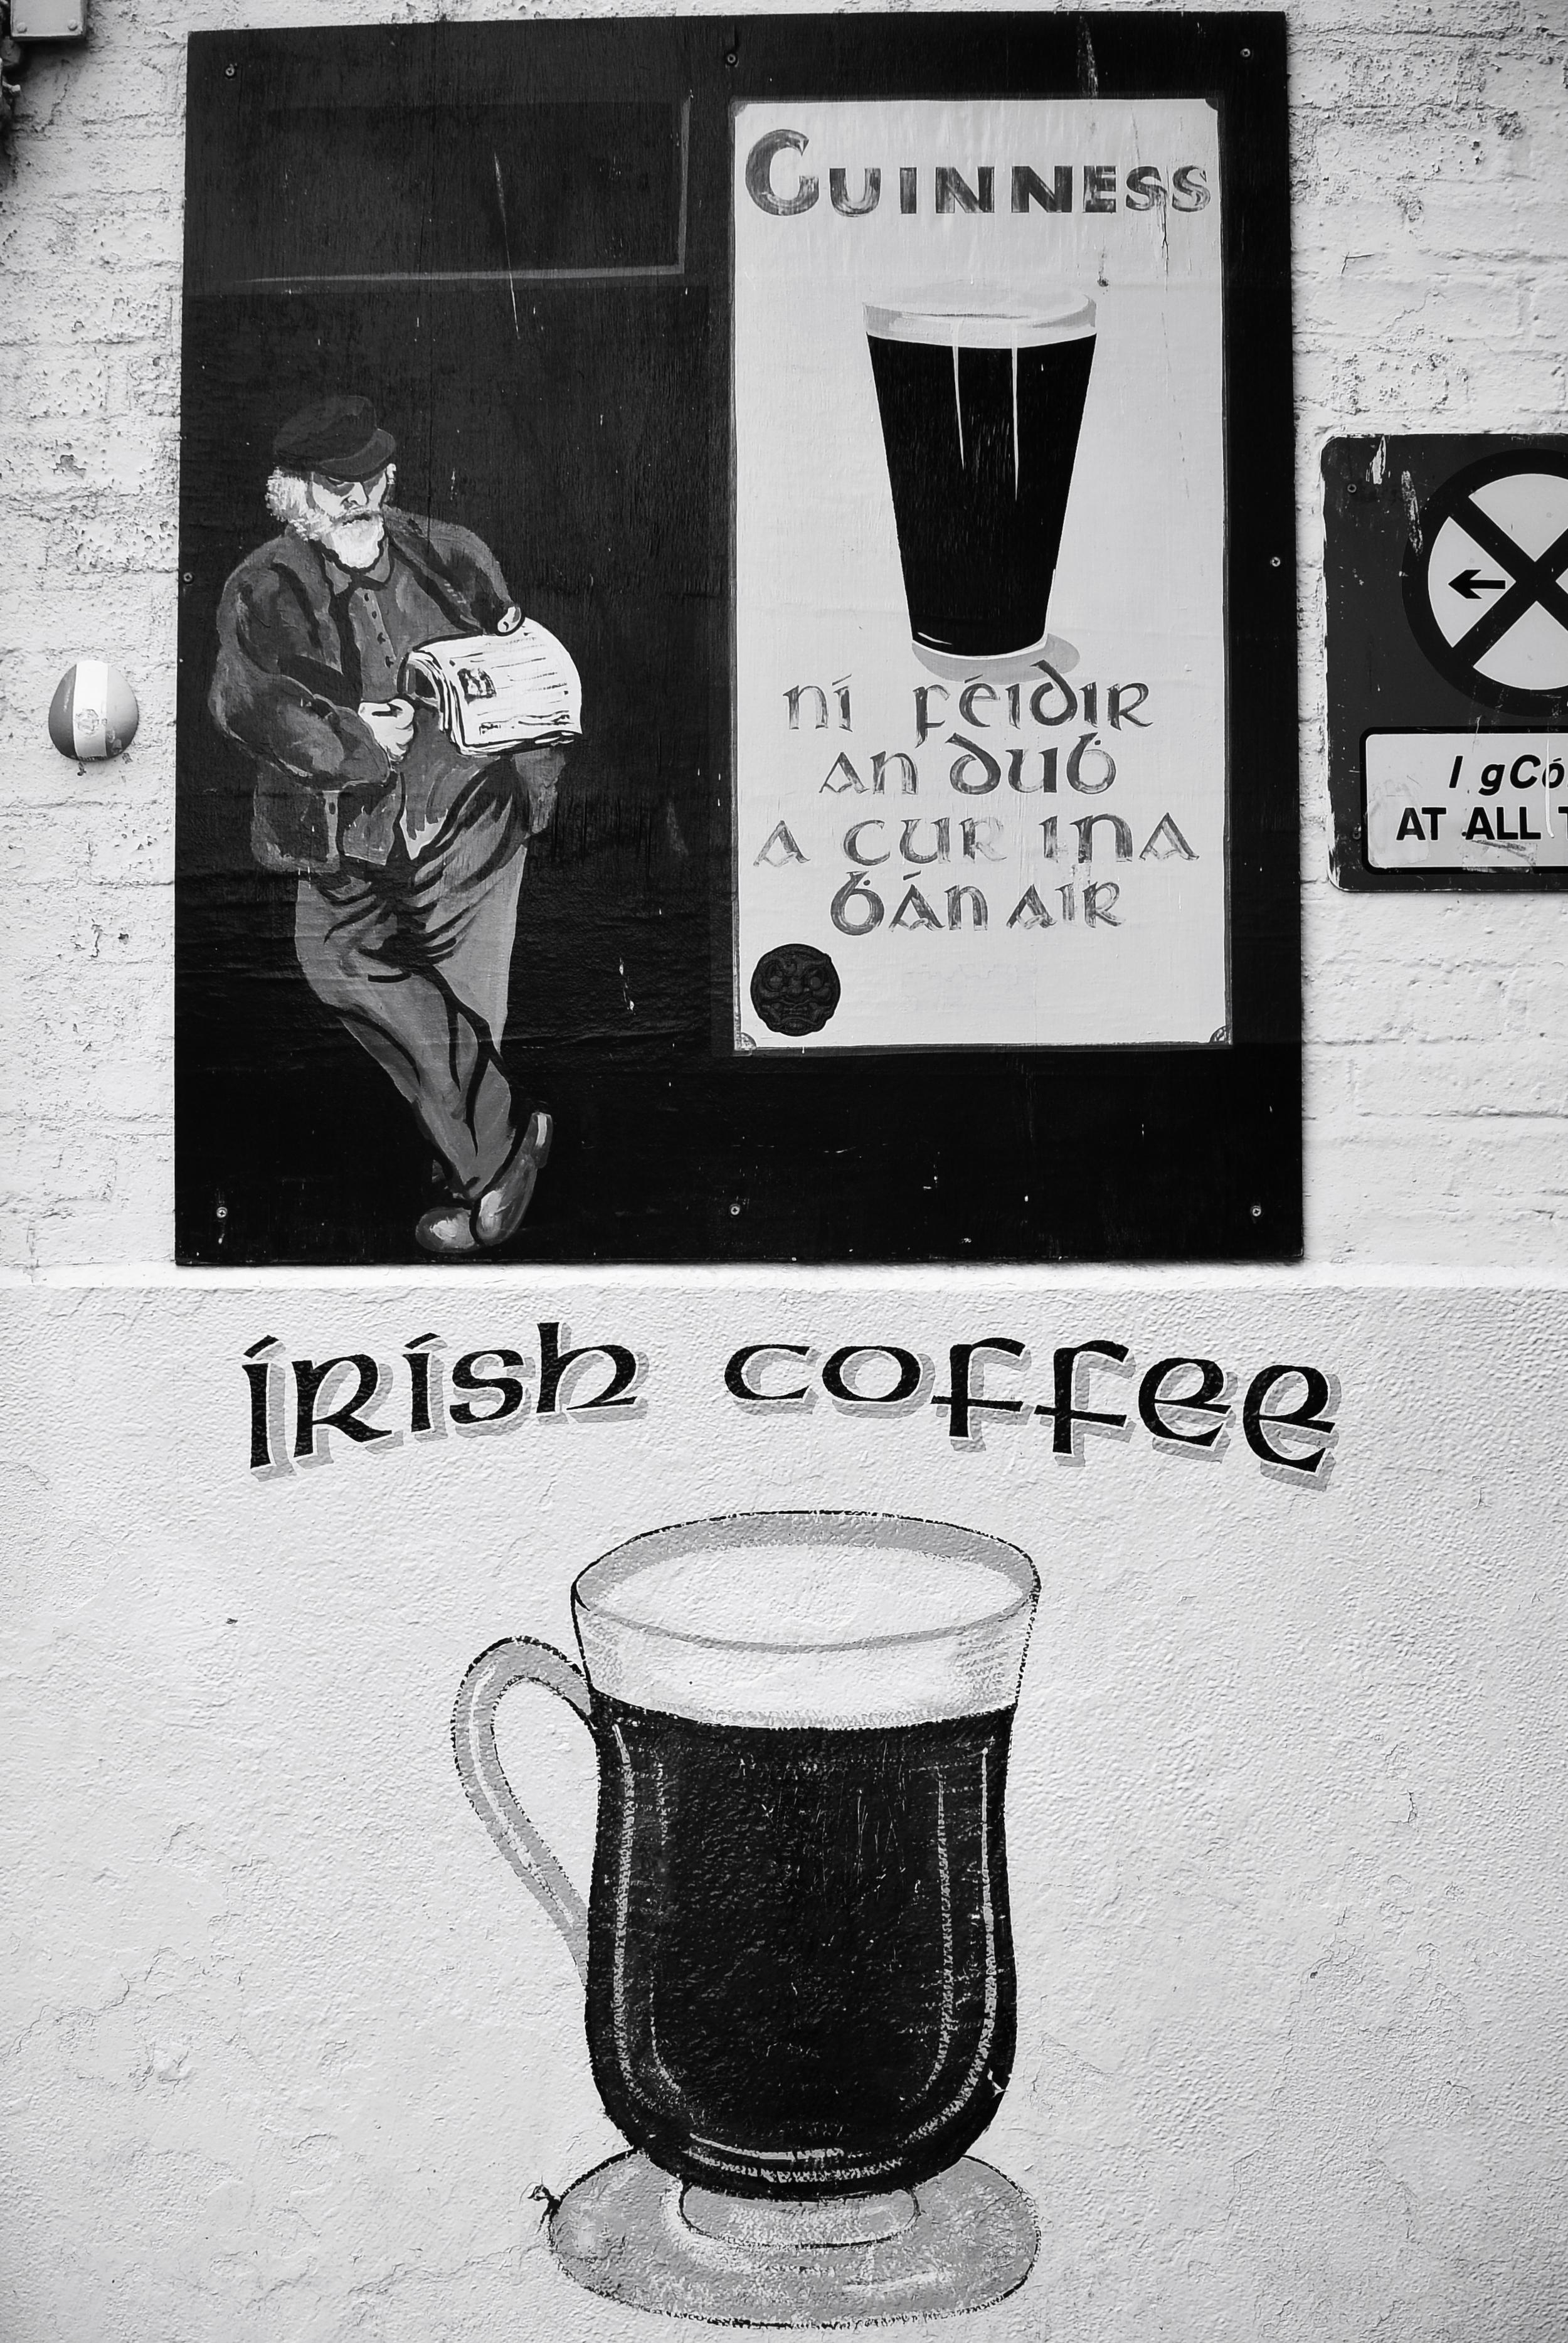 Guinness and Irish Coffee Street Art, Dublin